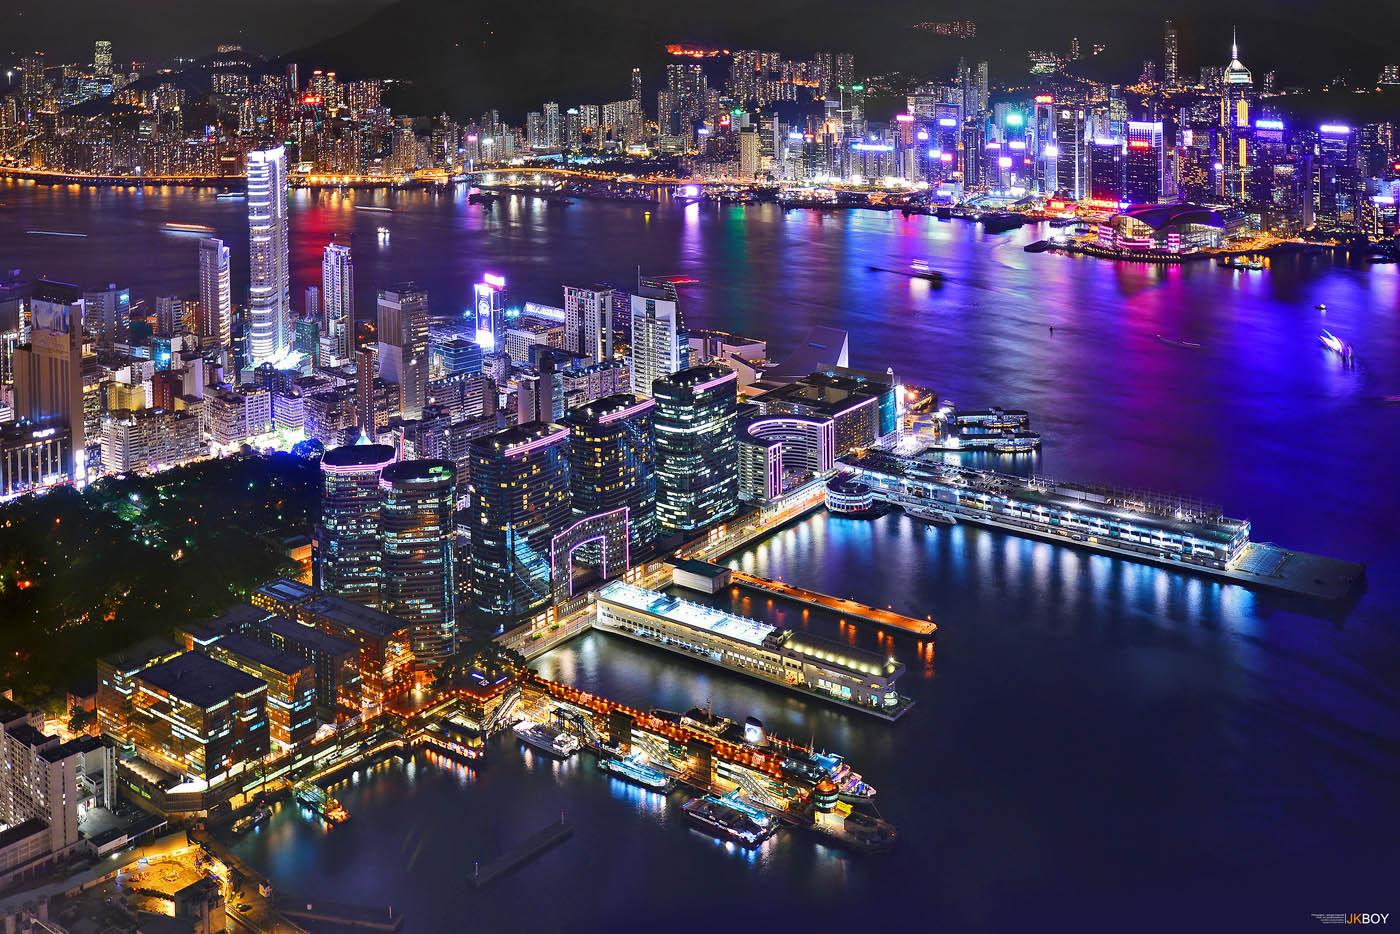 14 night city travel photography victoria harbour by jkboy jatenipat